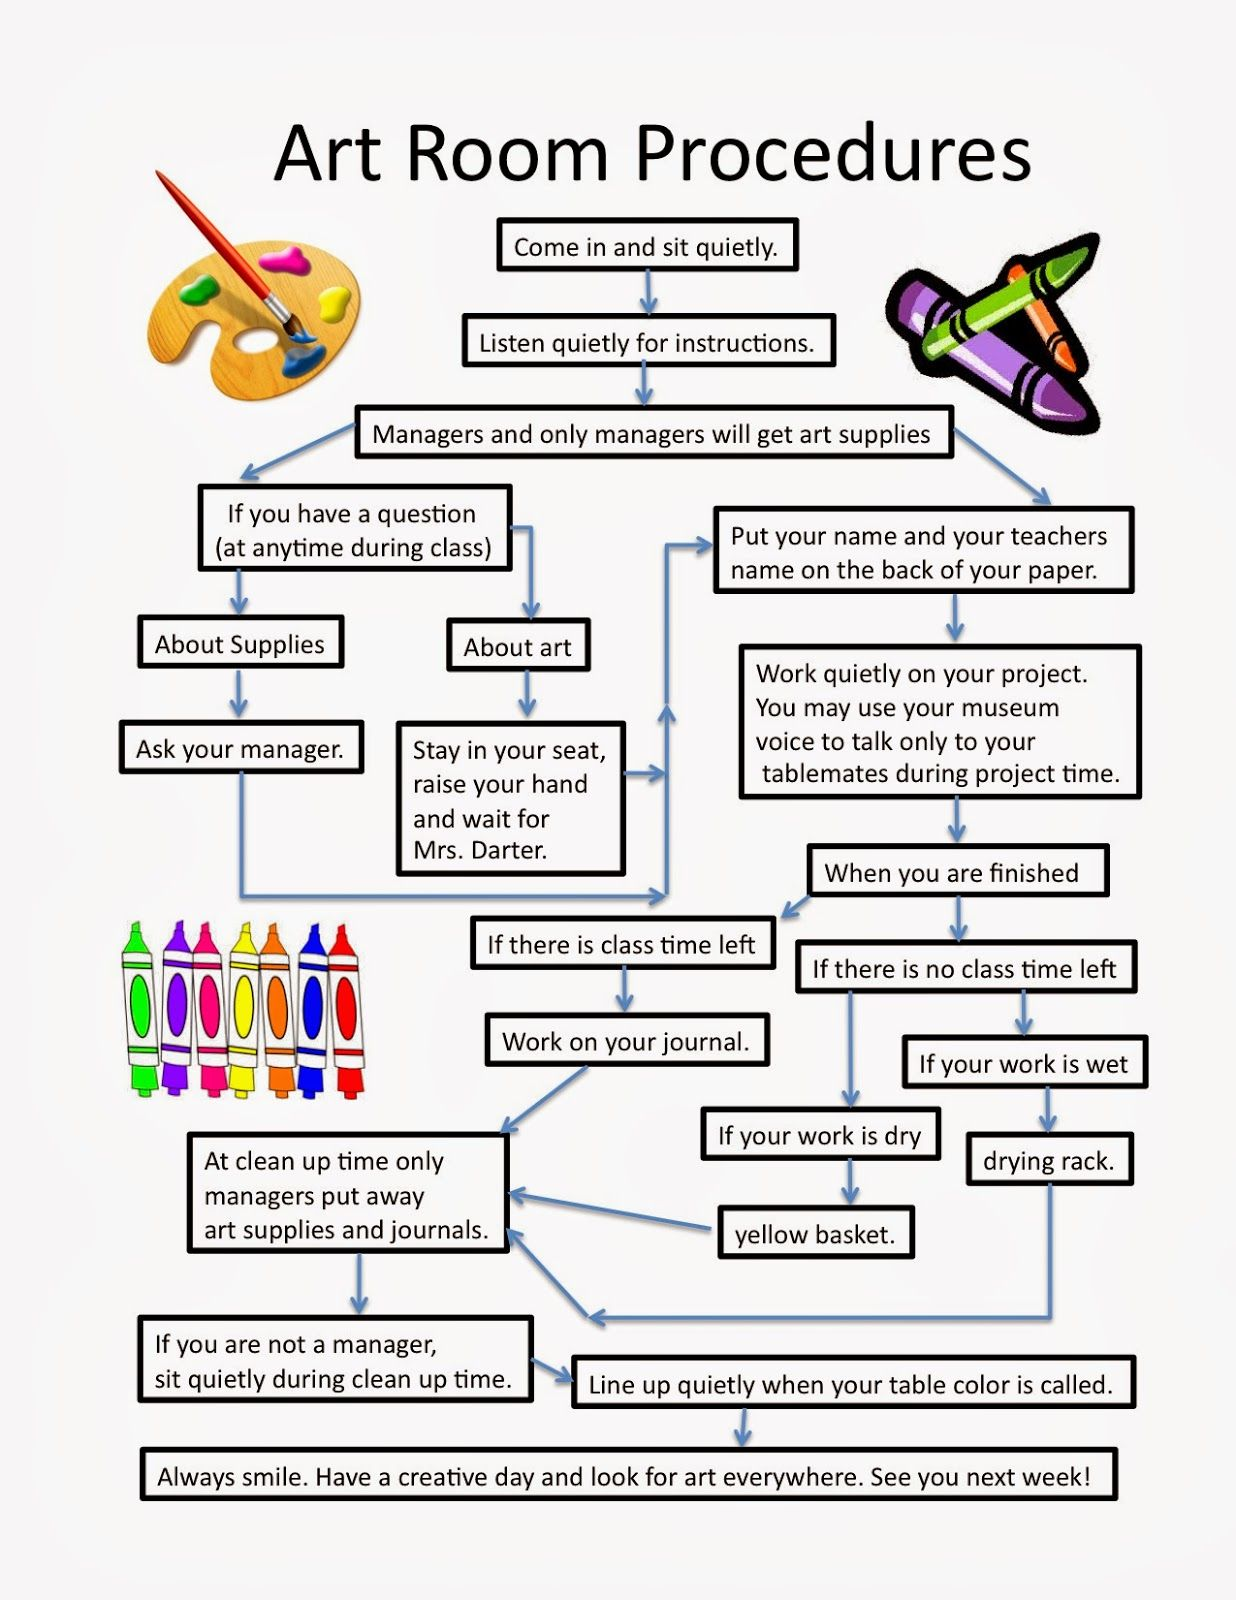 Classroom procedures classroom organization classroom management - Art Room Blog Classroom Procedures Flowchart I Like The Part About